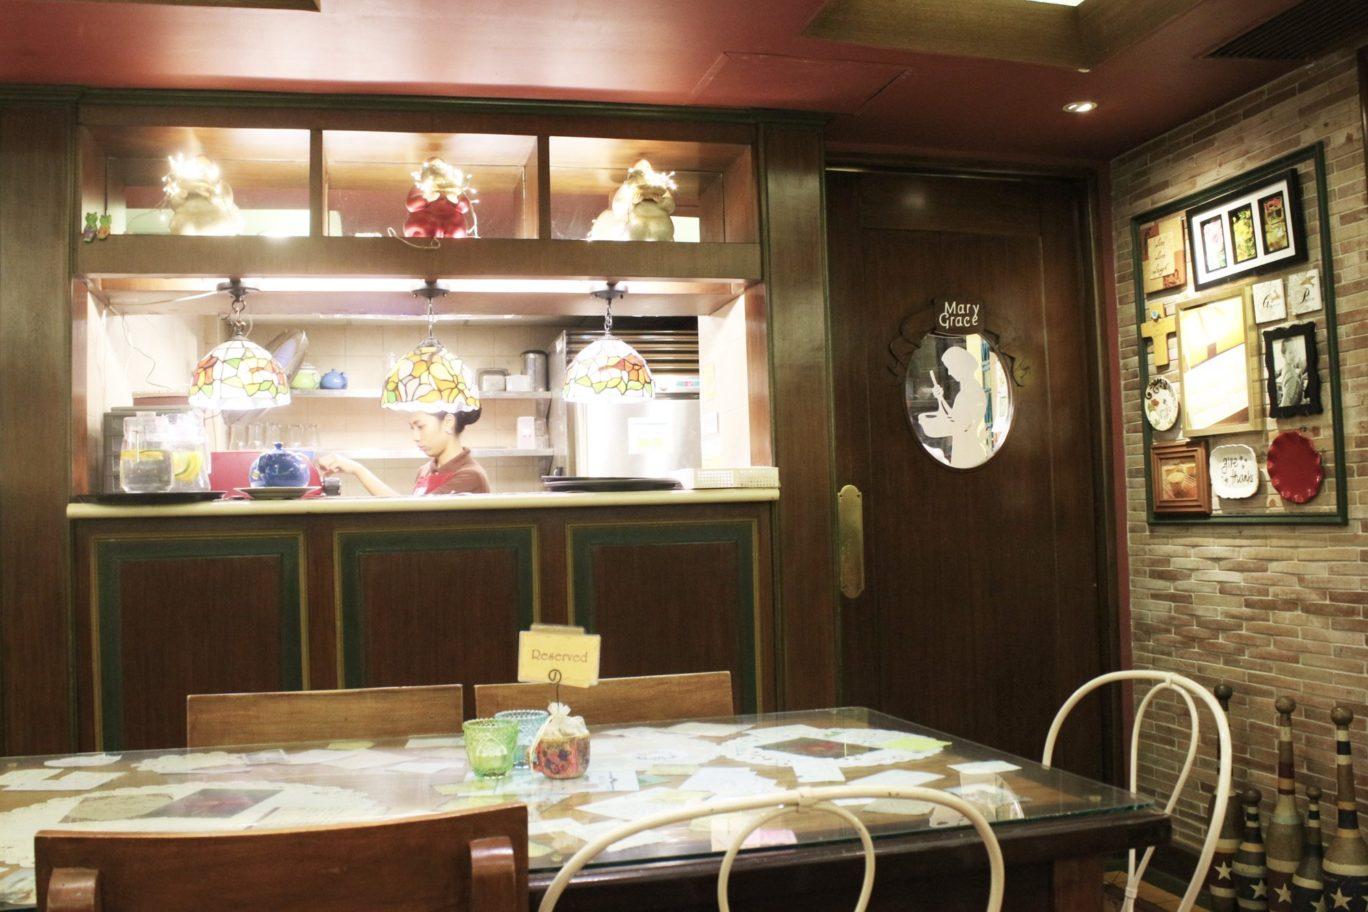 Kitchen at Mary Grace, Greenbelt 3